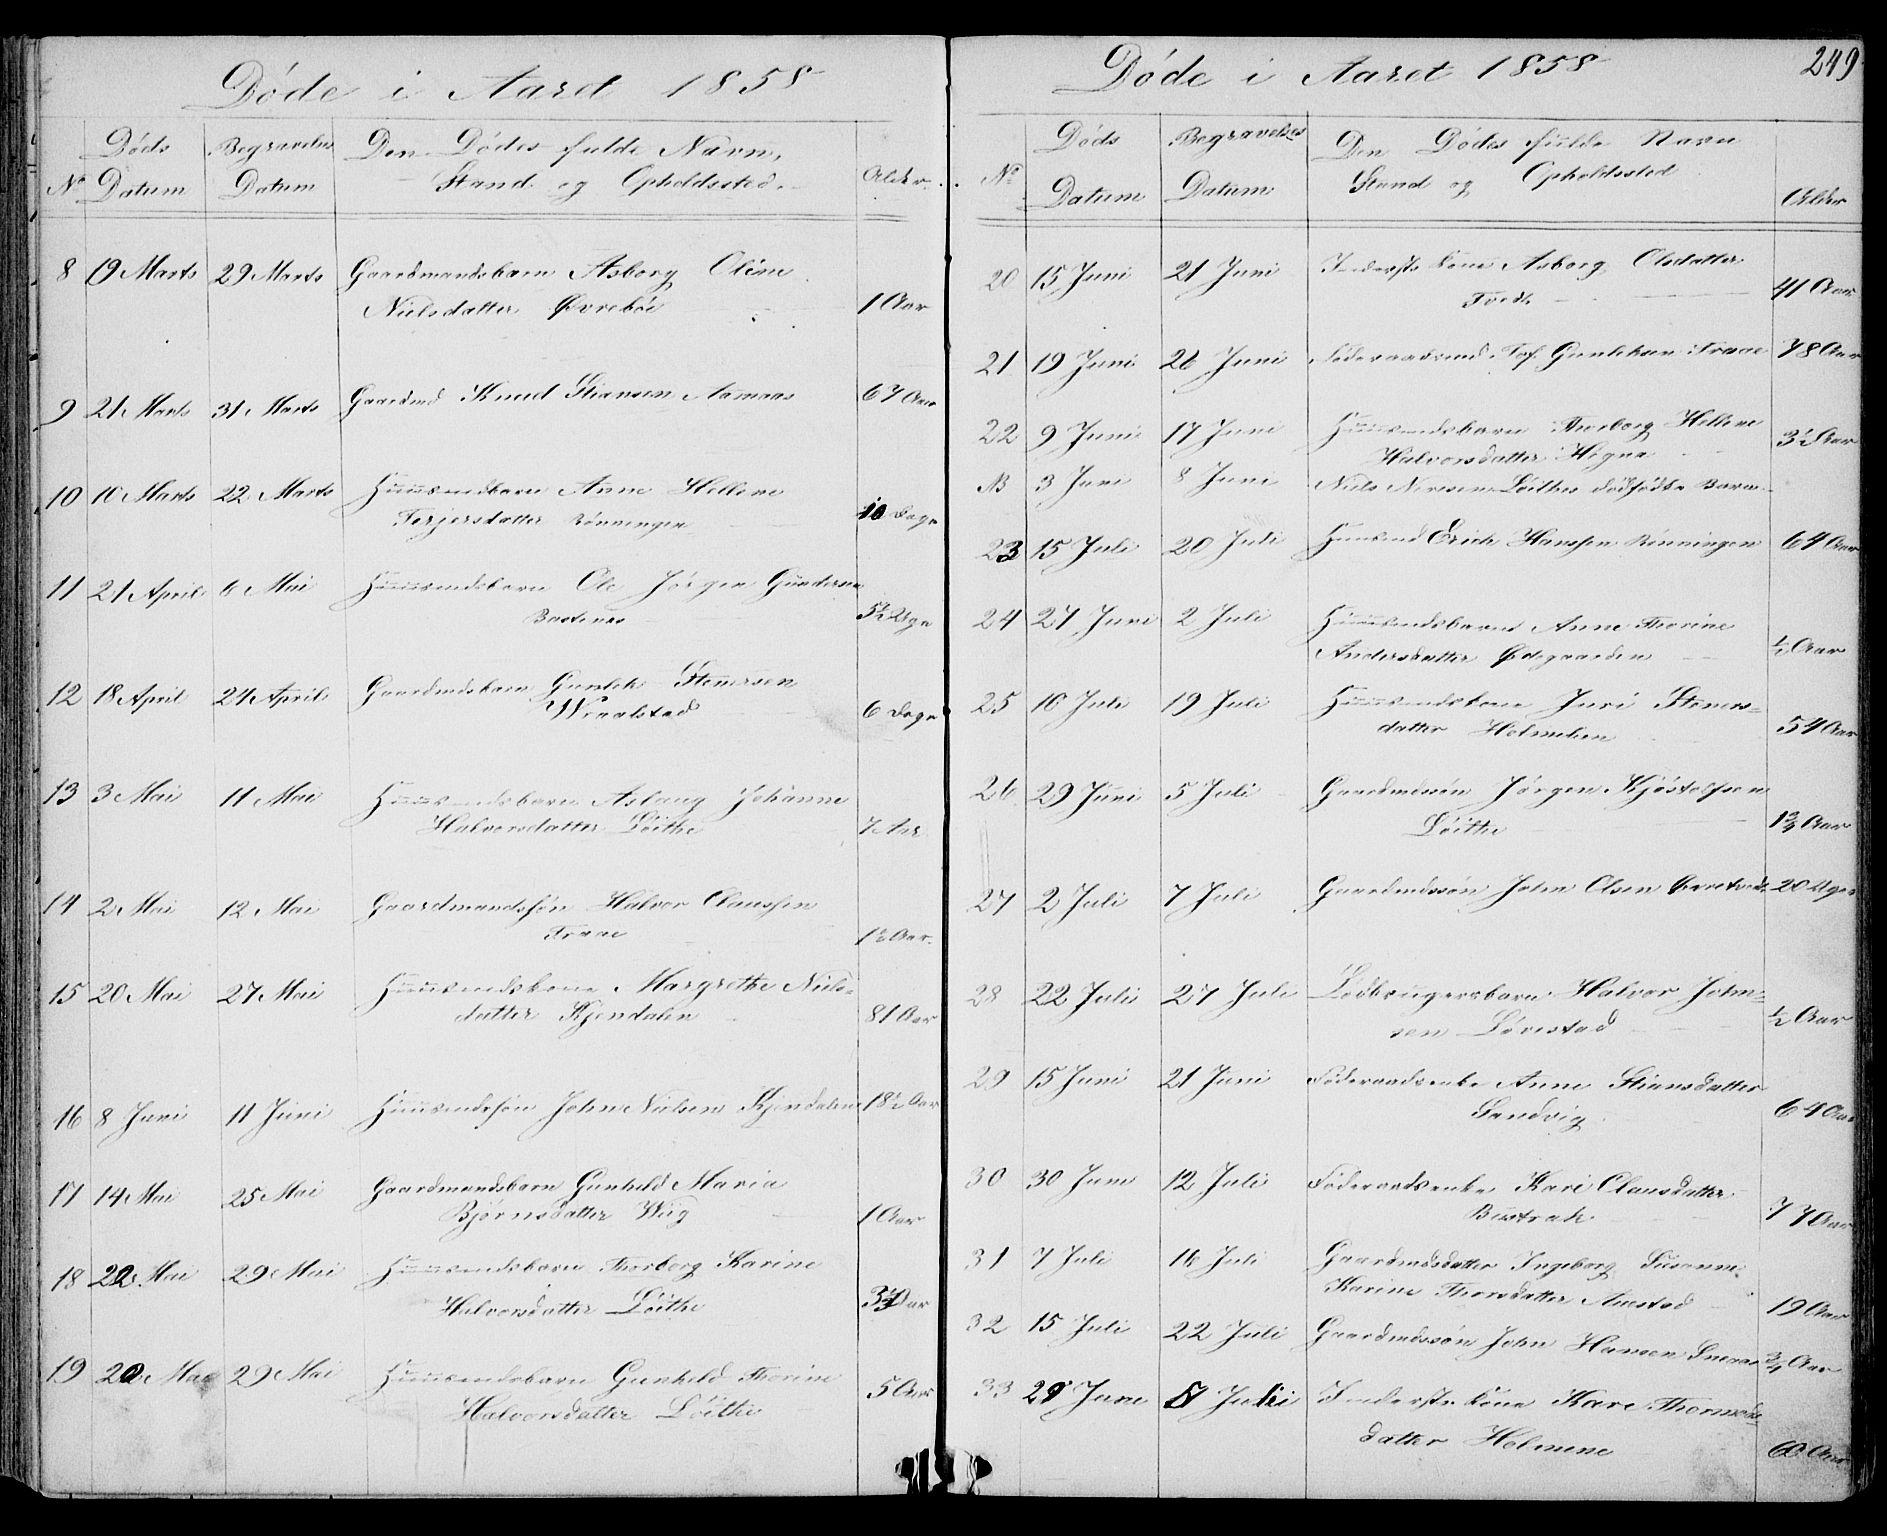 SAKO, Drangedal kirkebøker, G/Gb/L0001: Klokkerbok nr. II 1, 1856-1894, s. 249